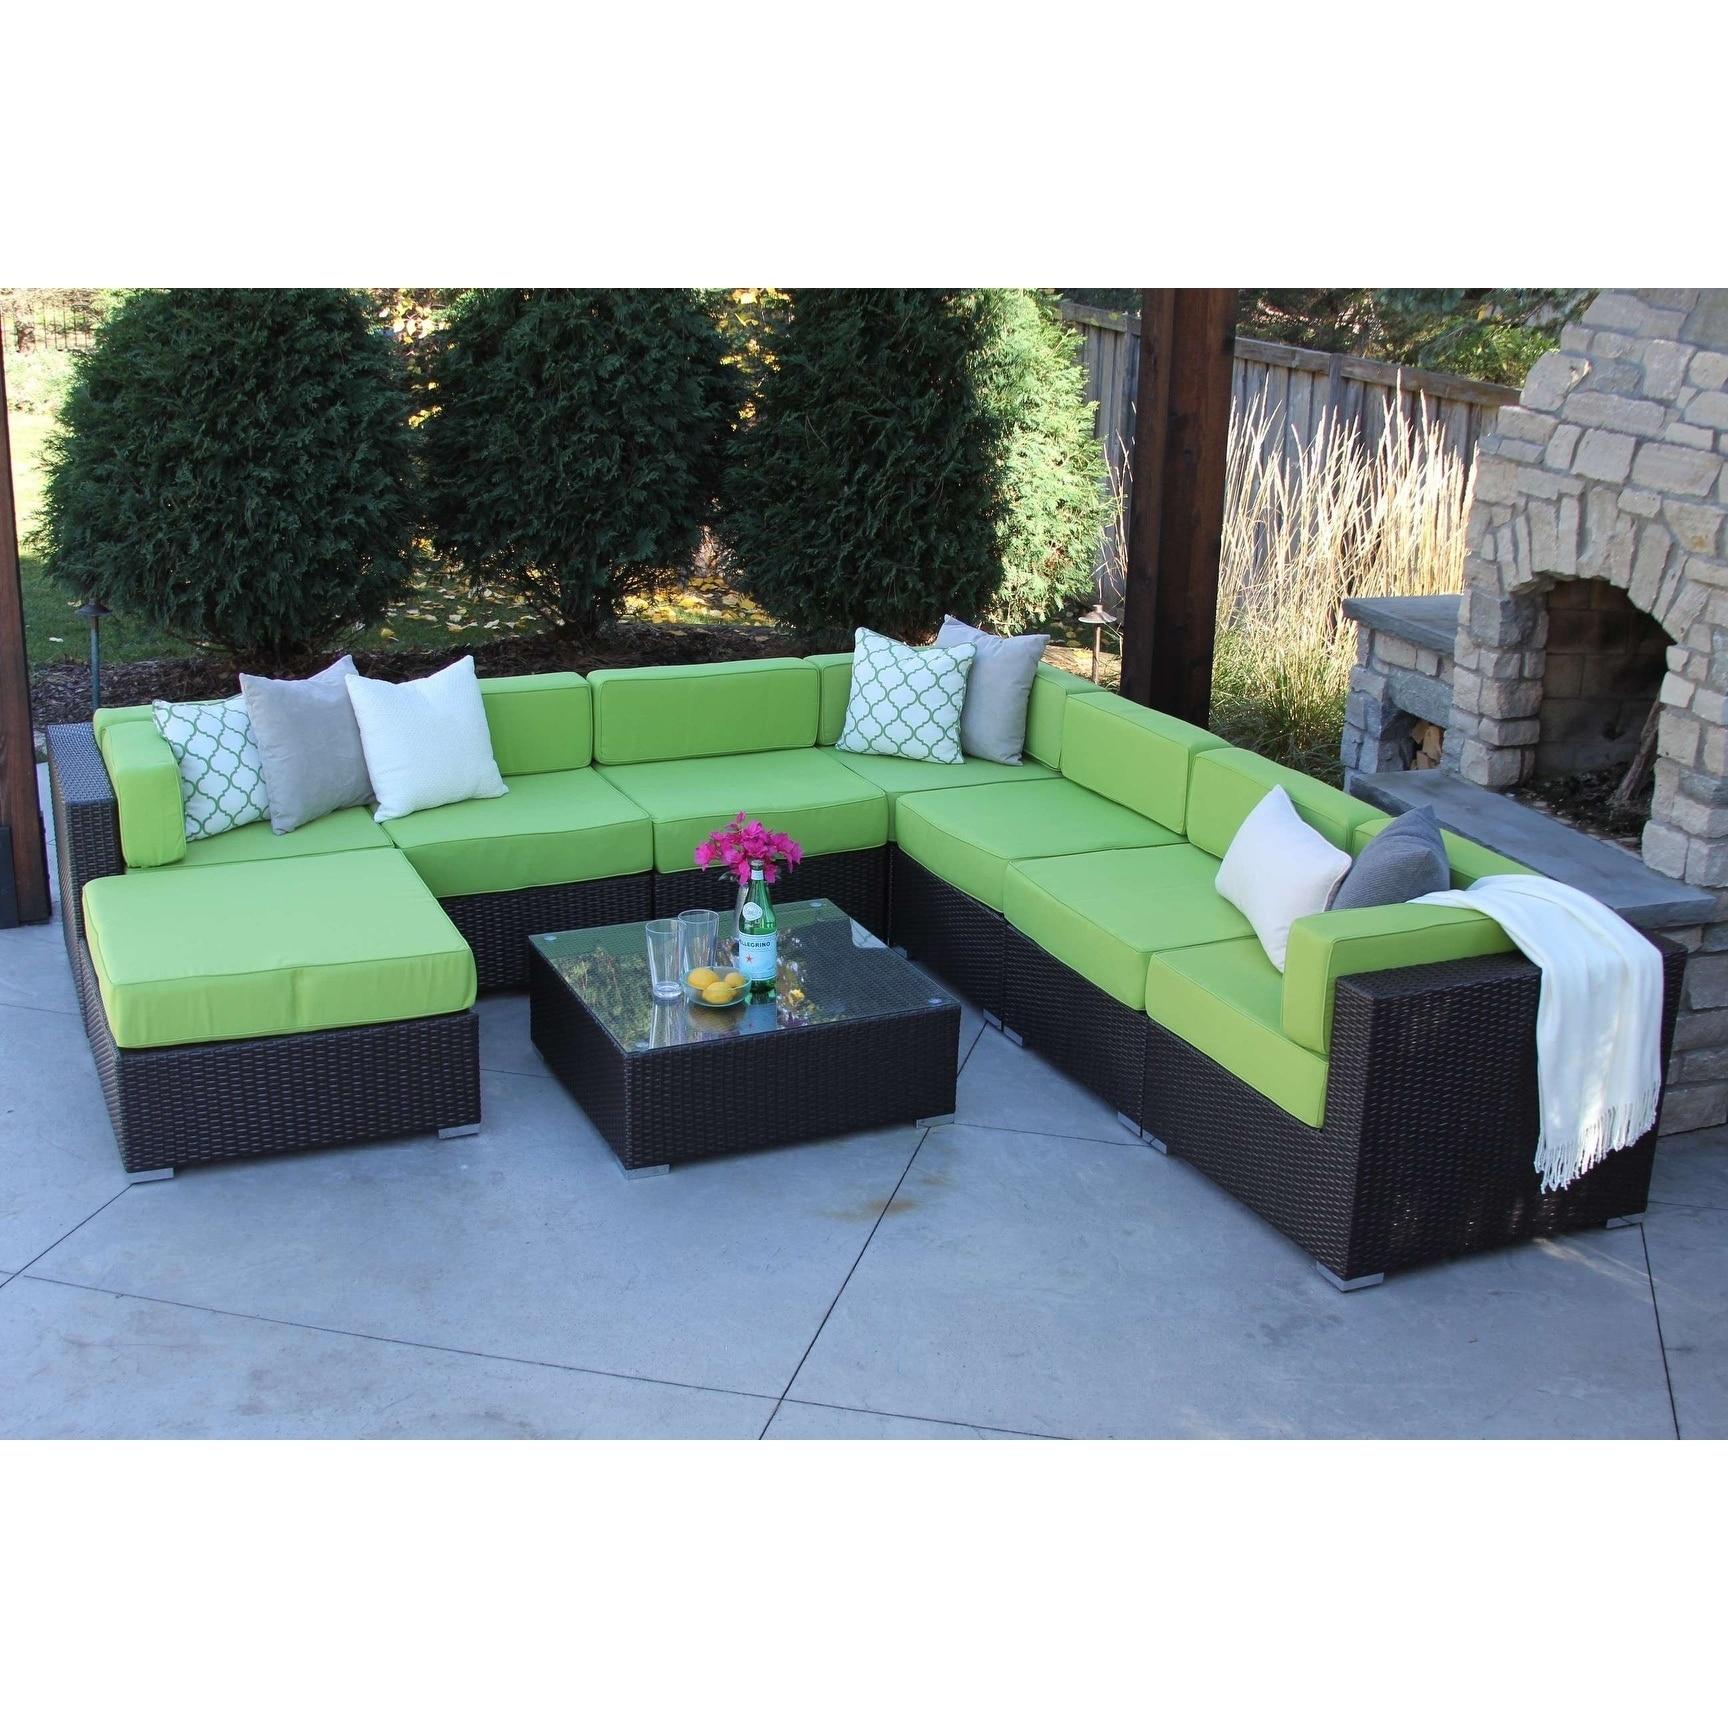 living veloclub on turquoise martha patio co lake furniture mse stewart outdoors cushions patrofi